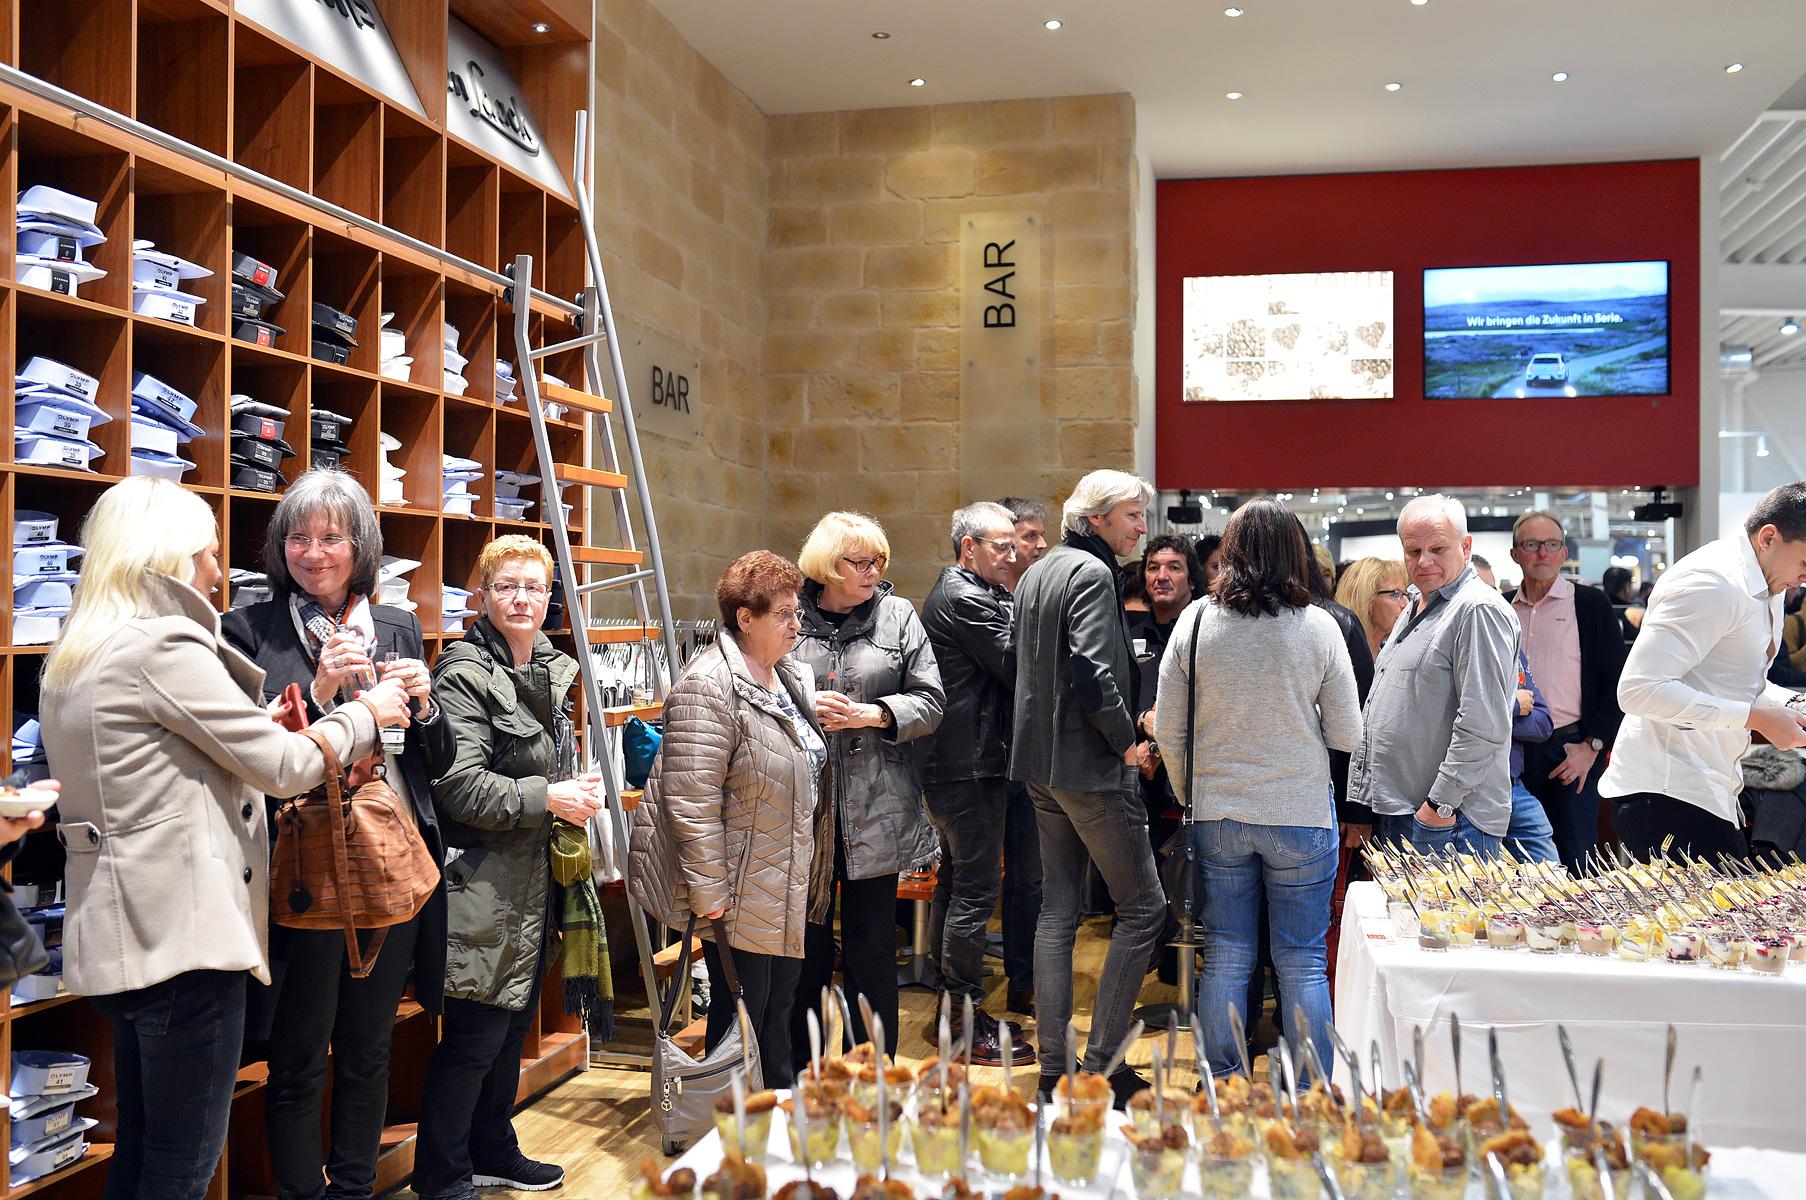 Robert-Leys-Eventfotografie-Koblenz-Nicole-Bouillon-Fotografie